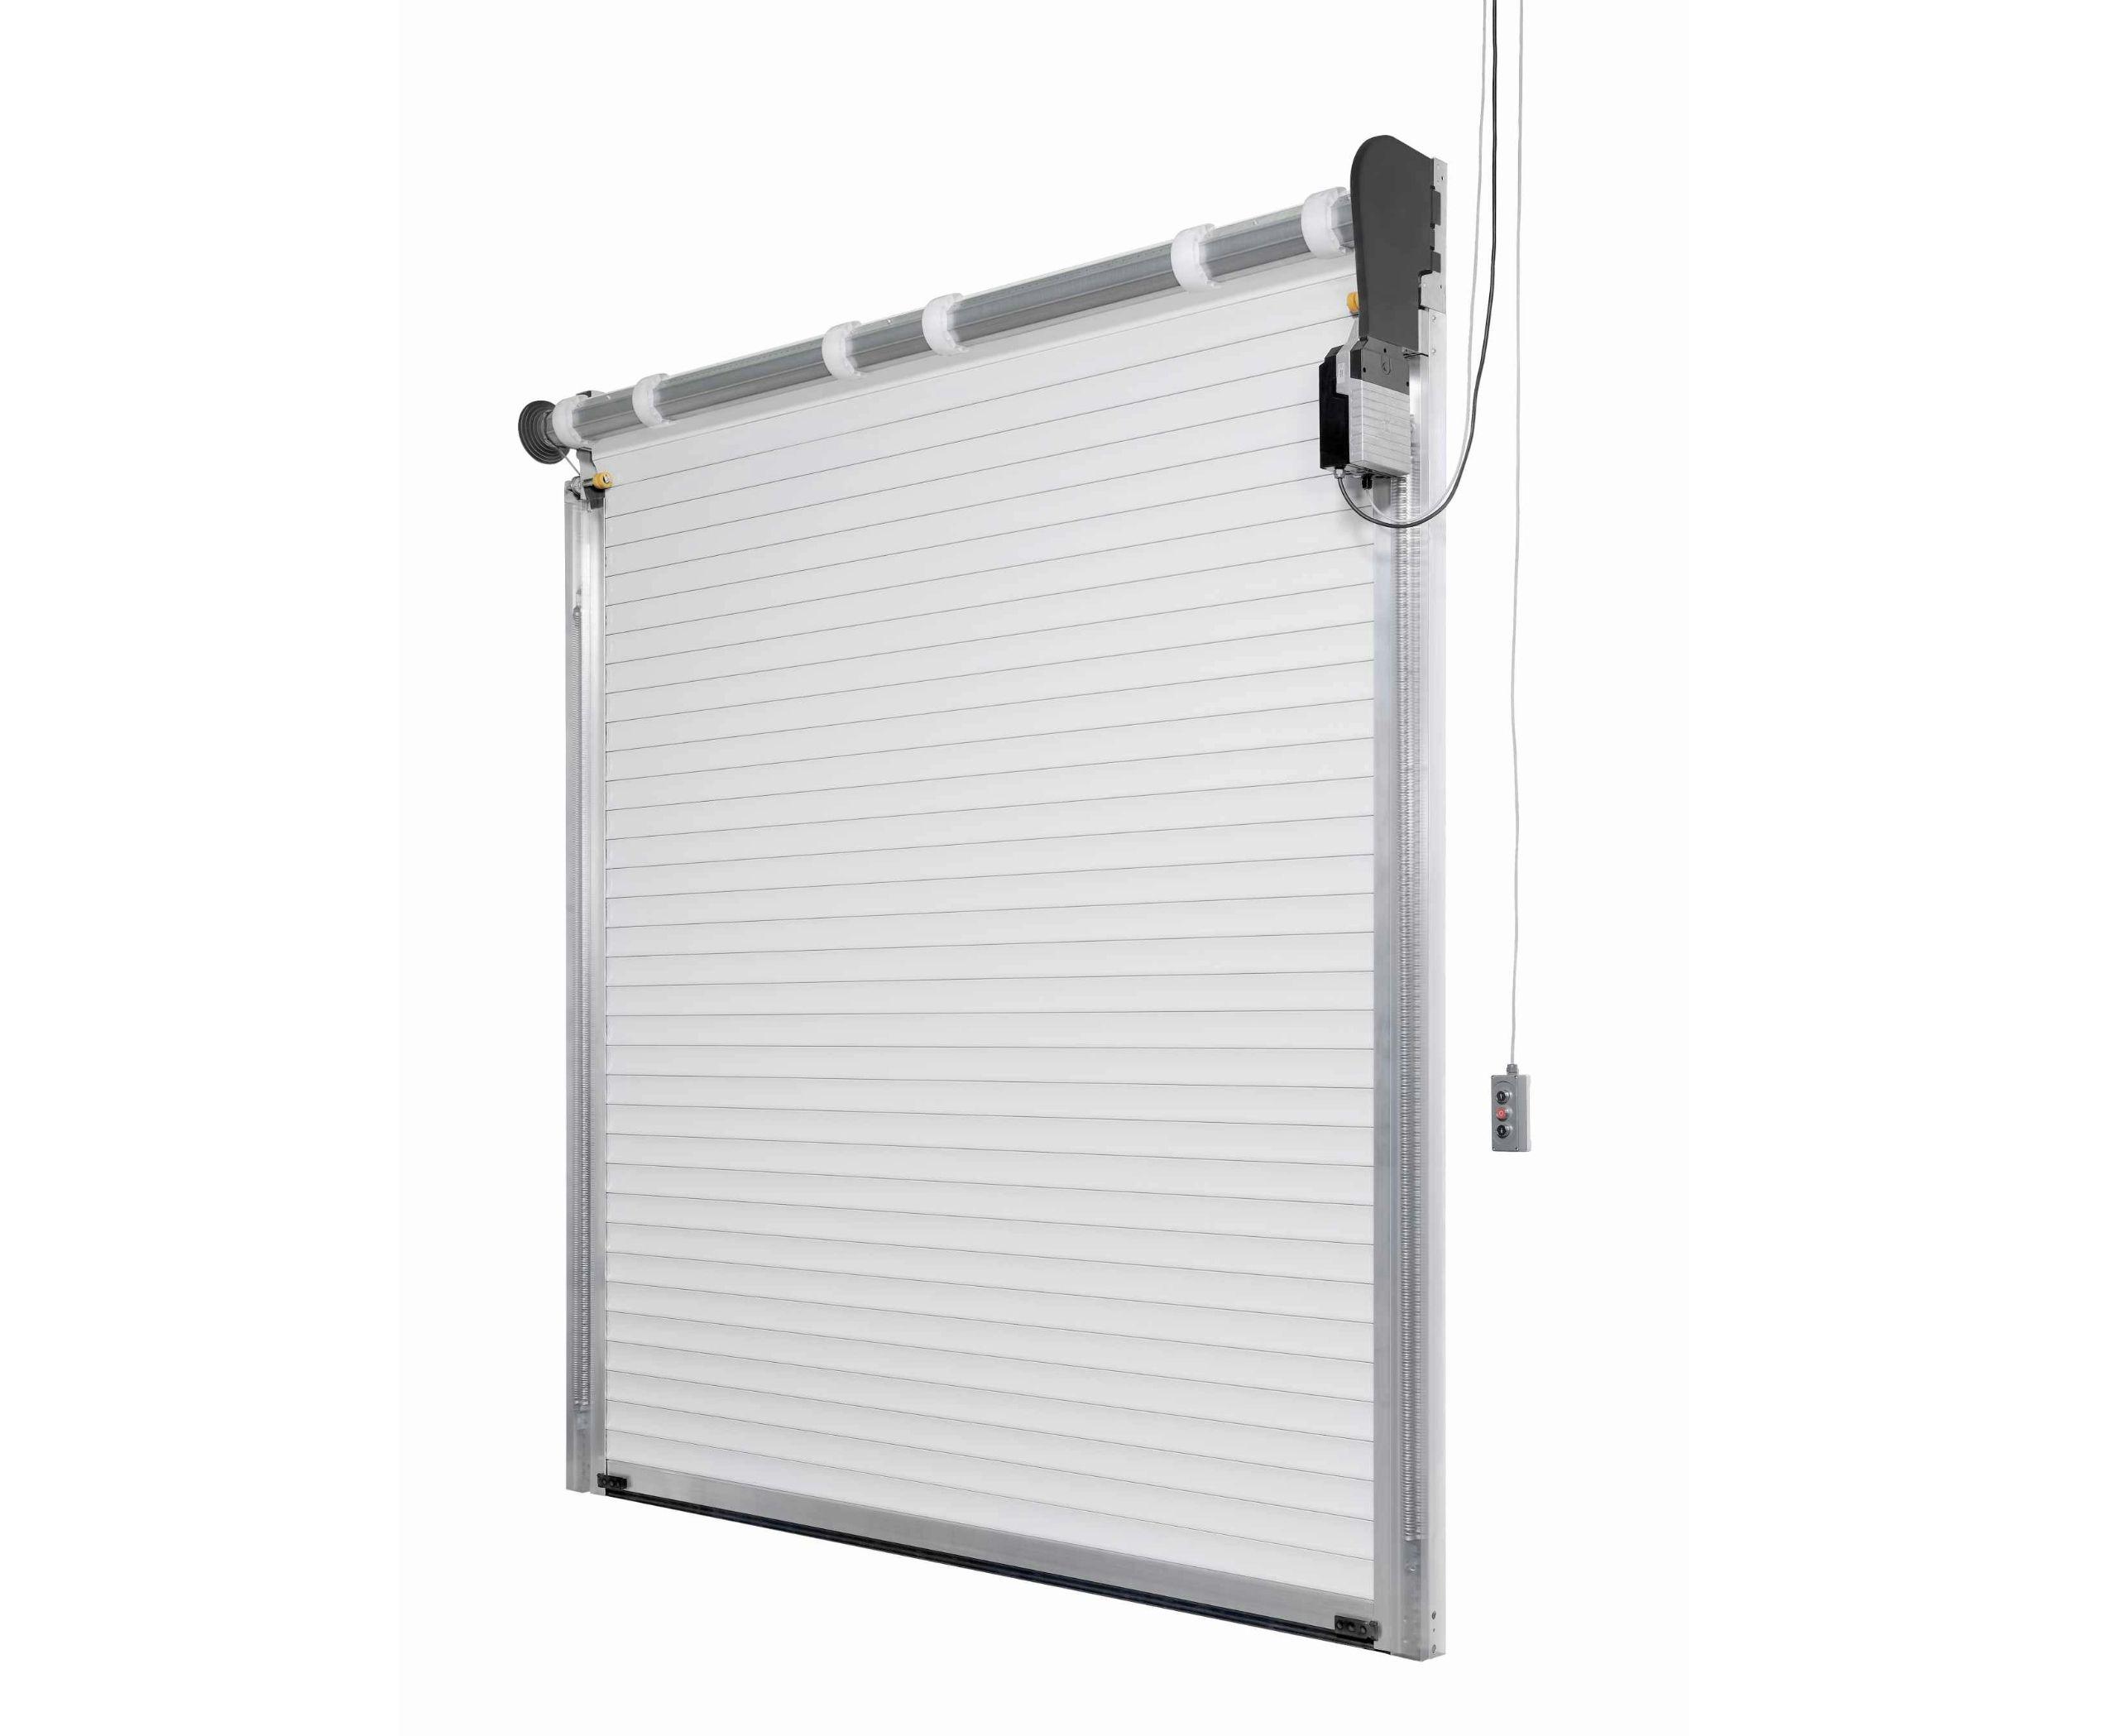 Sb puerta de garaje enrollable by h rmann italia - Serrande per finestre prezzi ...